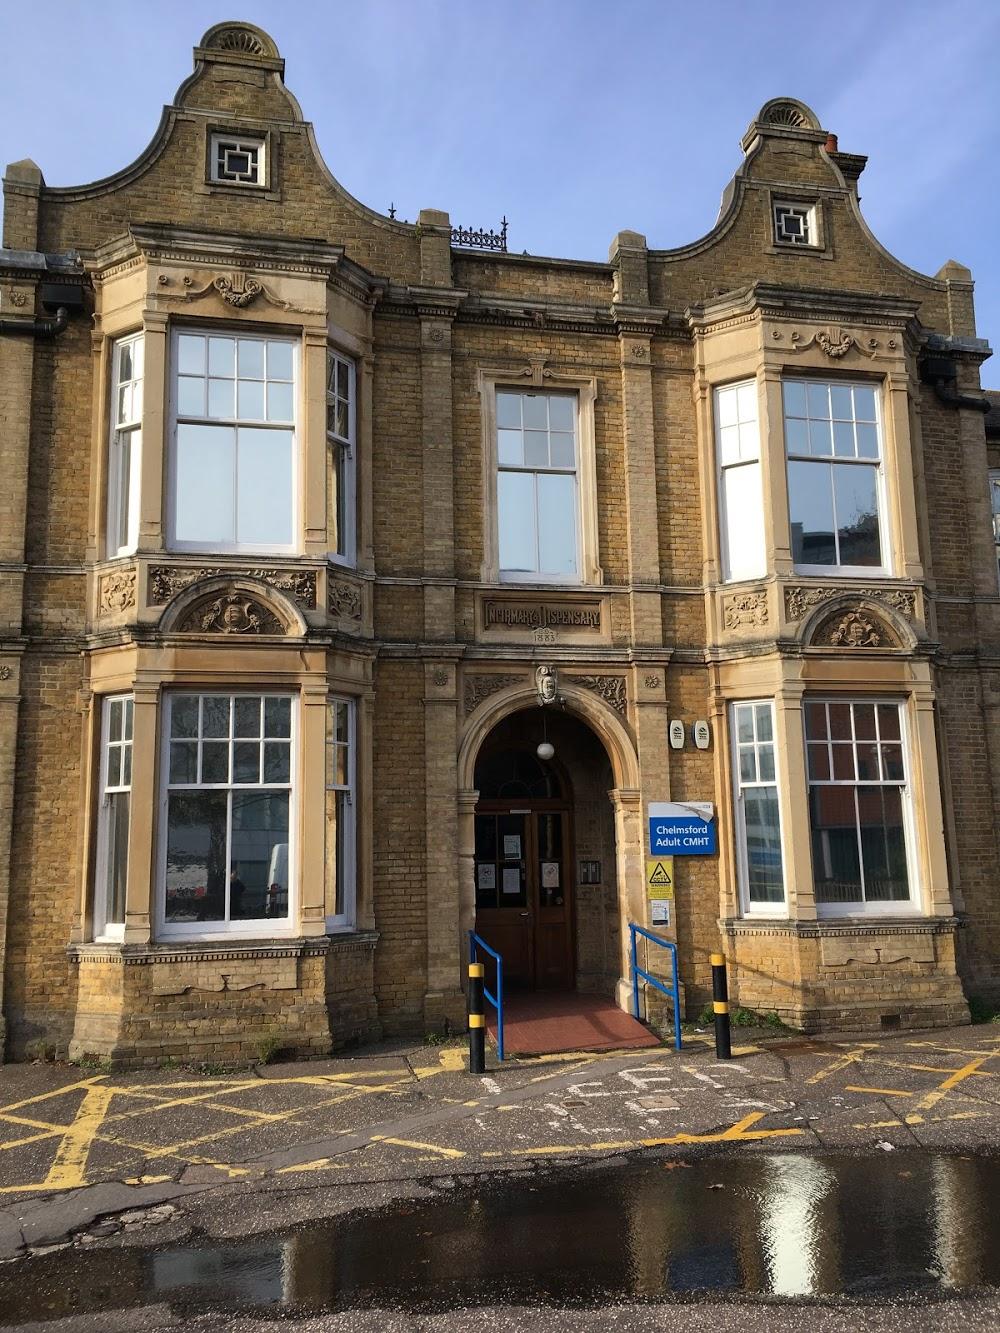 Chelmsford & Essex Hospital